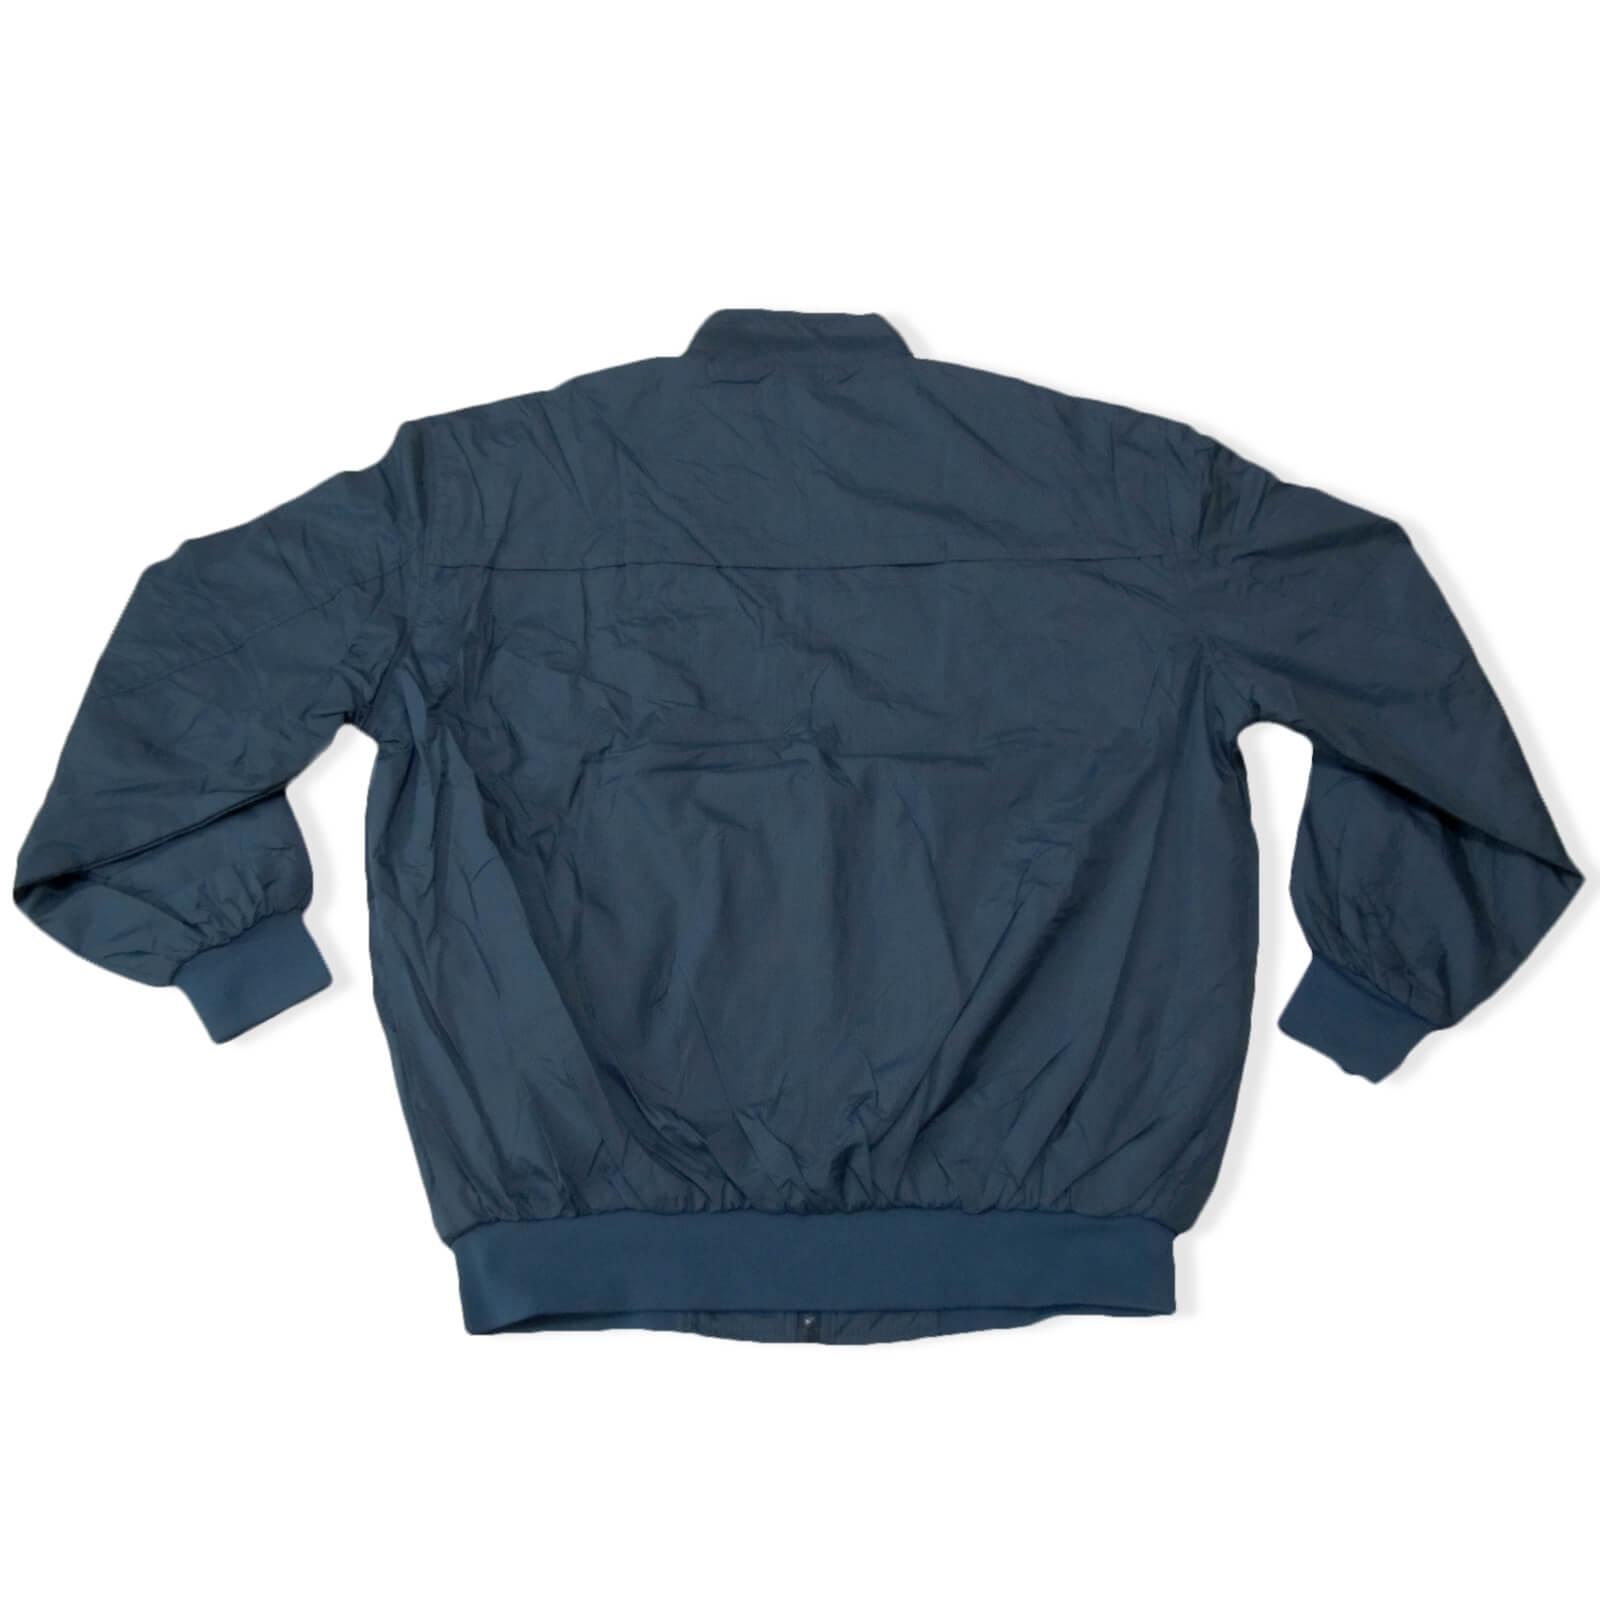 sun-e加大尺碼風衣外套、加大尺碼細格紋外套、加大尺碼夾克外套、加大尺碼防風外套、加大尺碼騎士外套(312-8882-08)藍綠色細格紋、(312-8882-21)灰色細格紋 胸圍:3L 4L(58~60英吋) [實體店面保障] 2